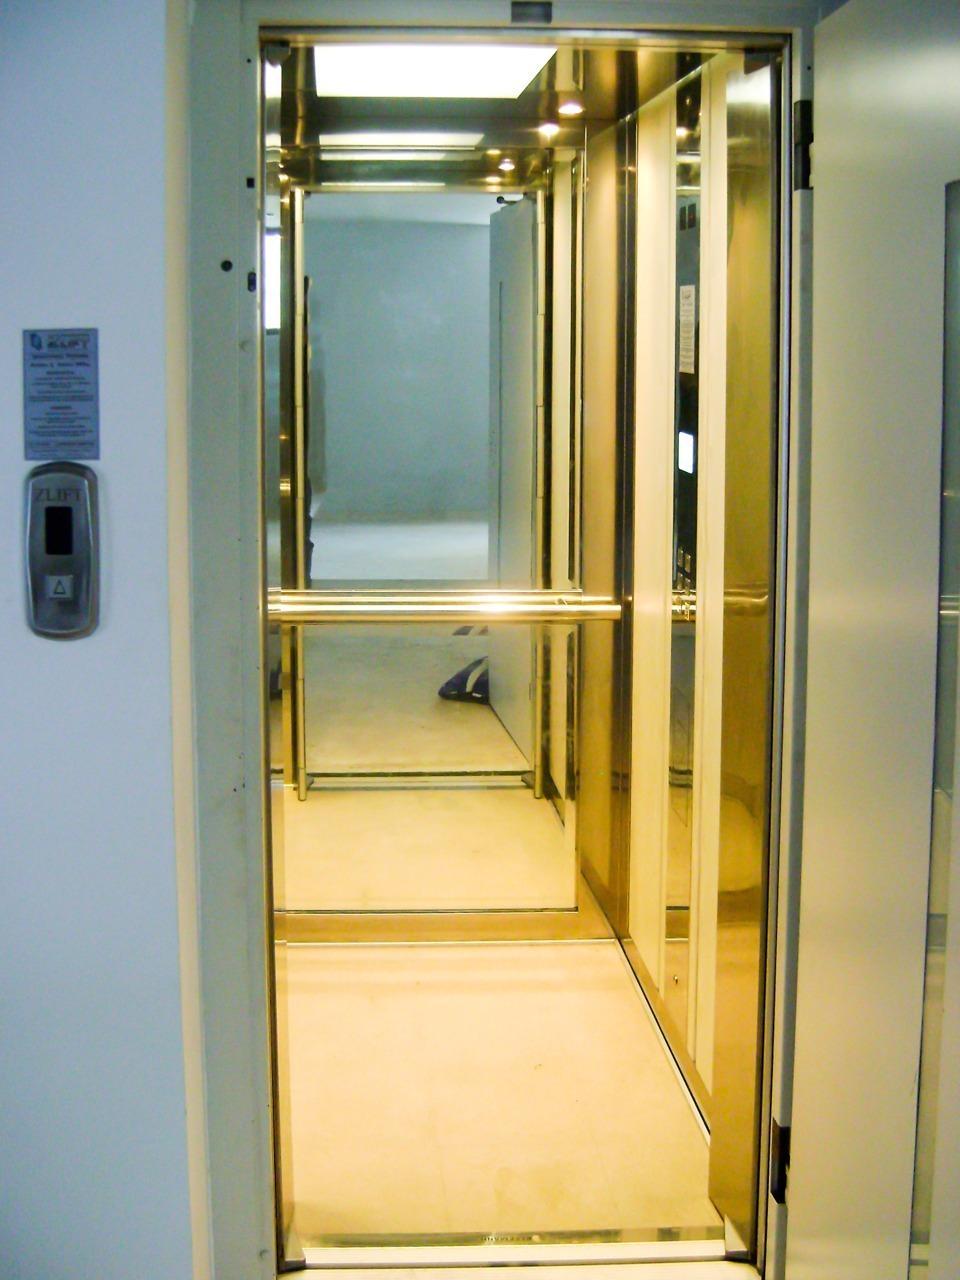 zlift-erga-lifts-24 Εγκατάσταση Ανελκυστήρα - Ρόδος